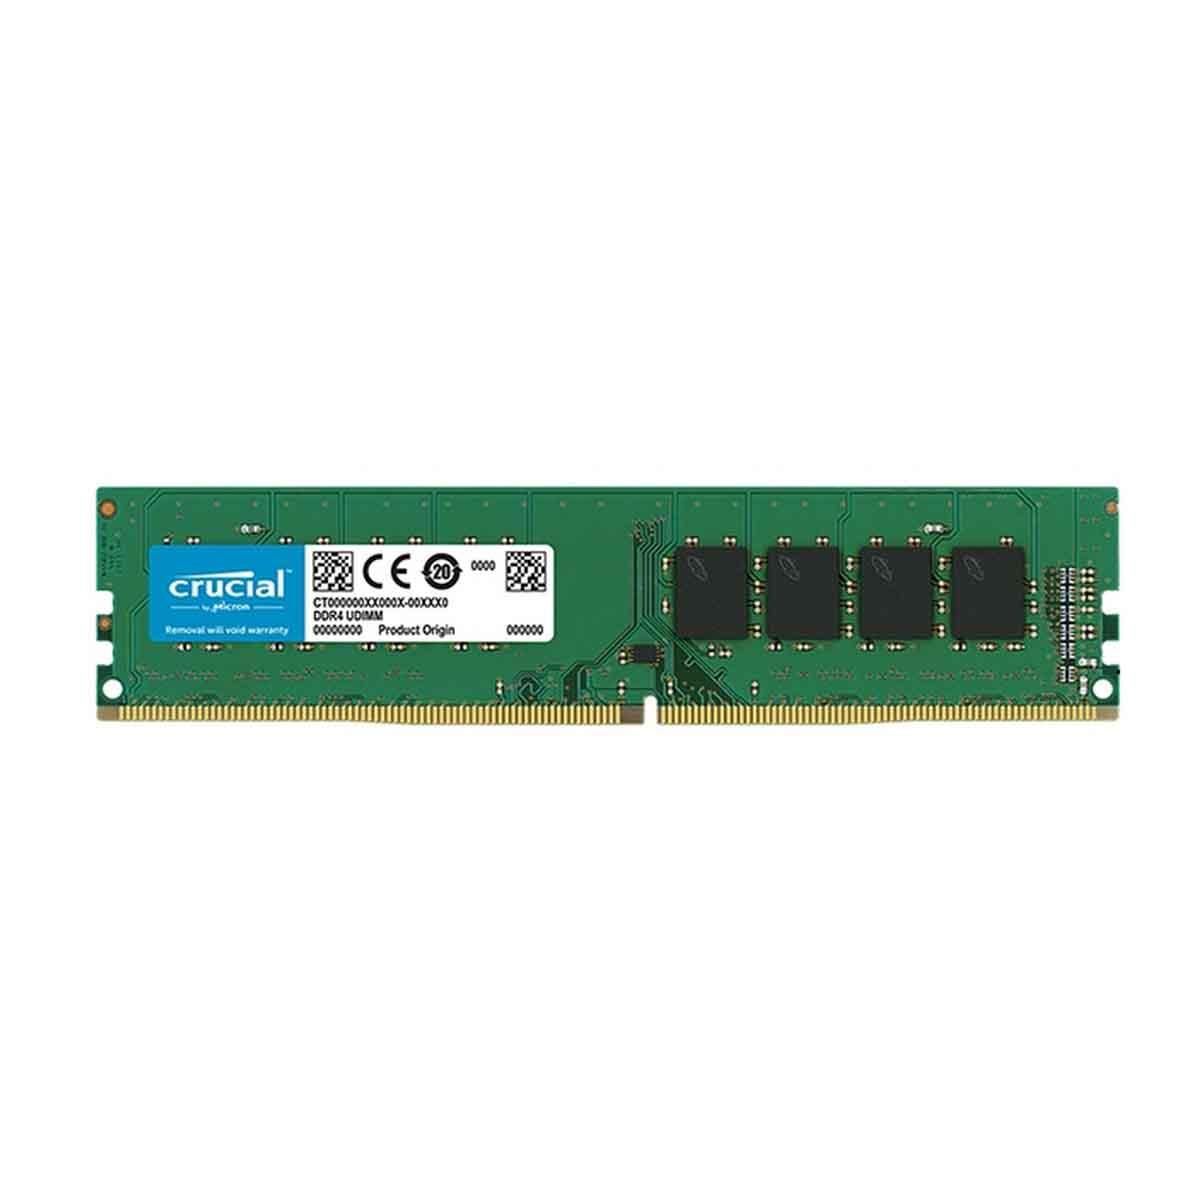 MEMORIA CRUCIAL 16GB DDR4 2666 UDIMM CT16G4DFRA266